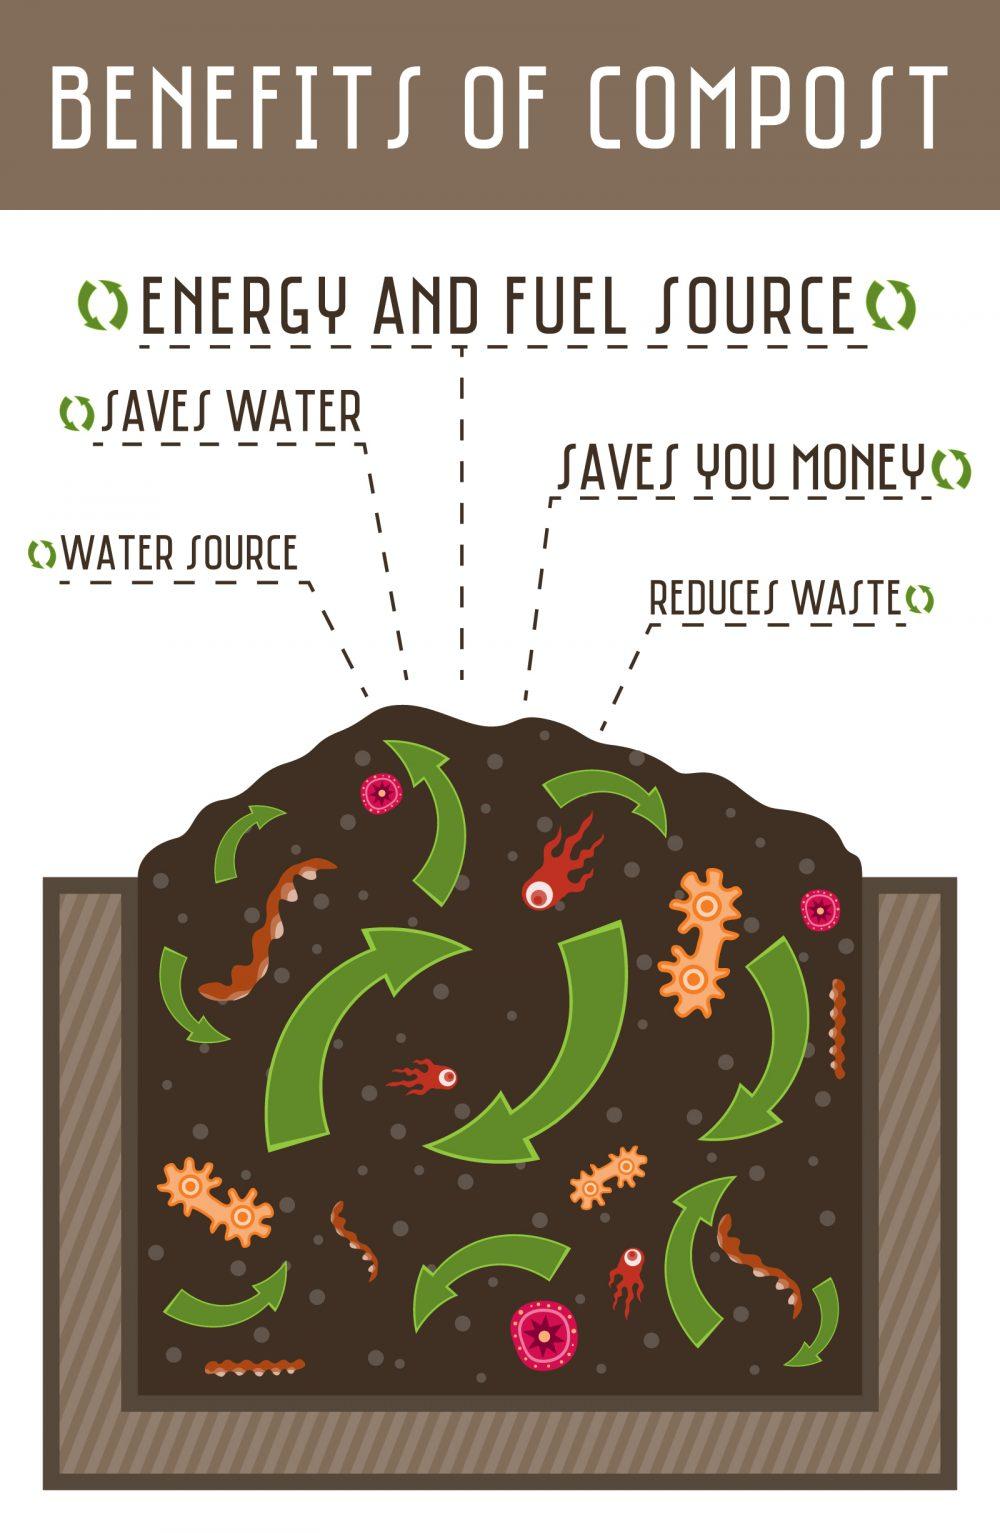 compost pile benefits